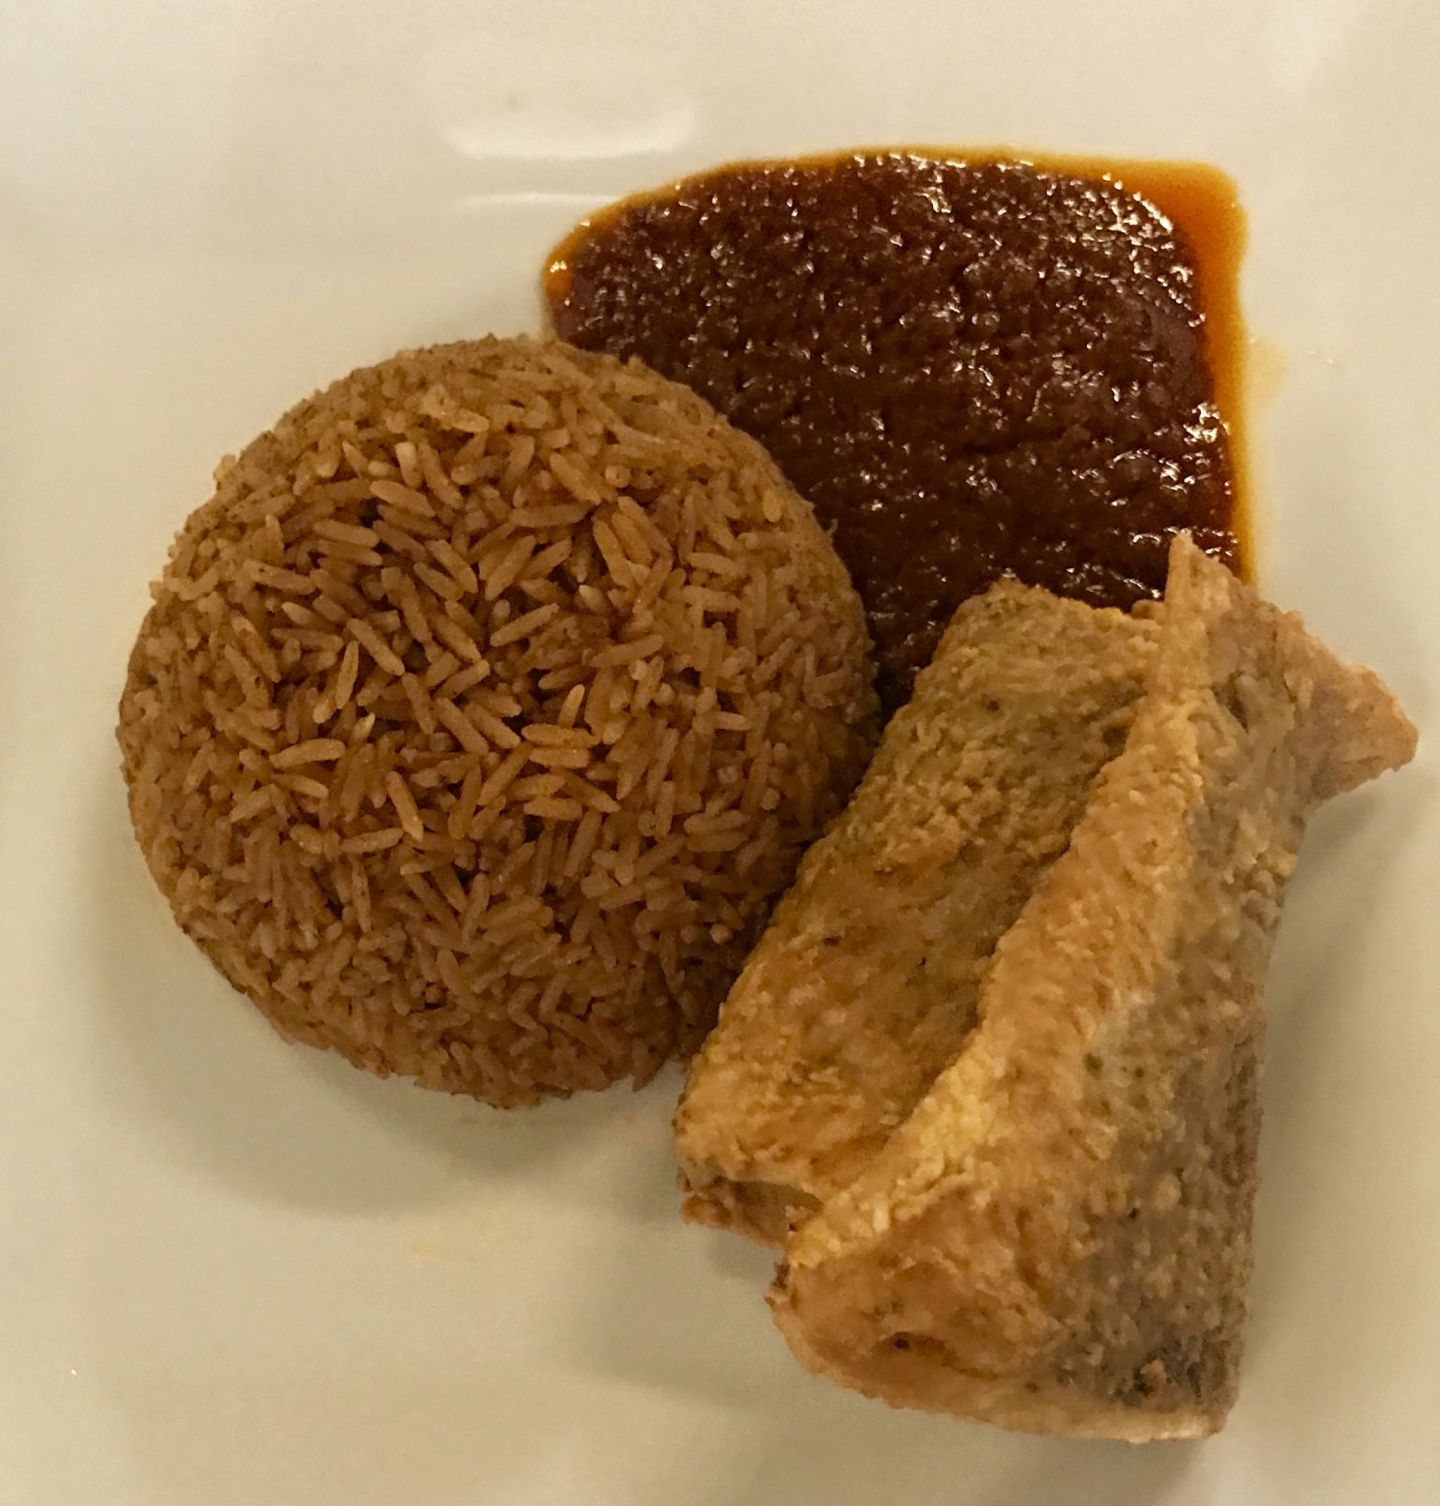 Beese Eats: Calabash | Adebisi Adebowale